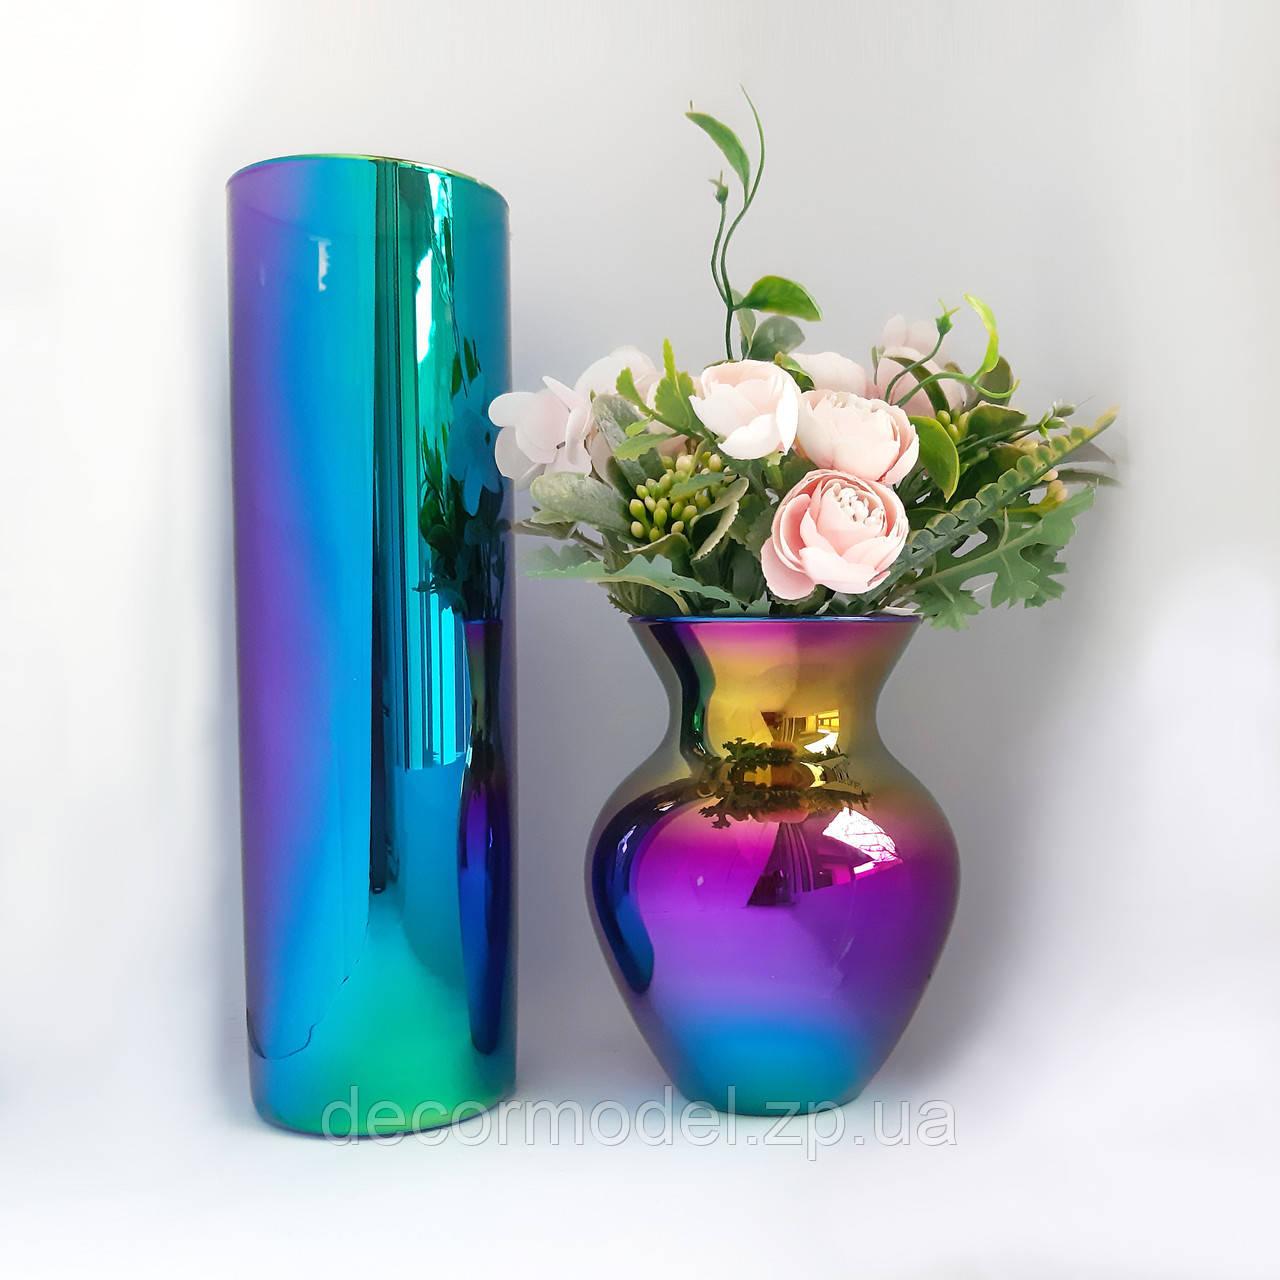 Ваза цилиндр Pasabache Flora 26 см 43767 голубой радуга